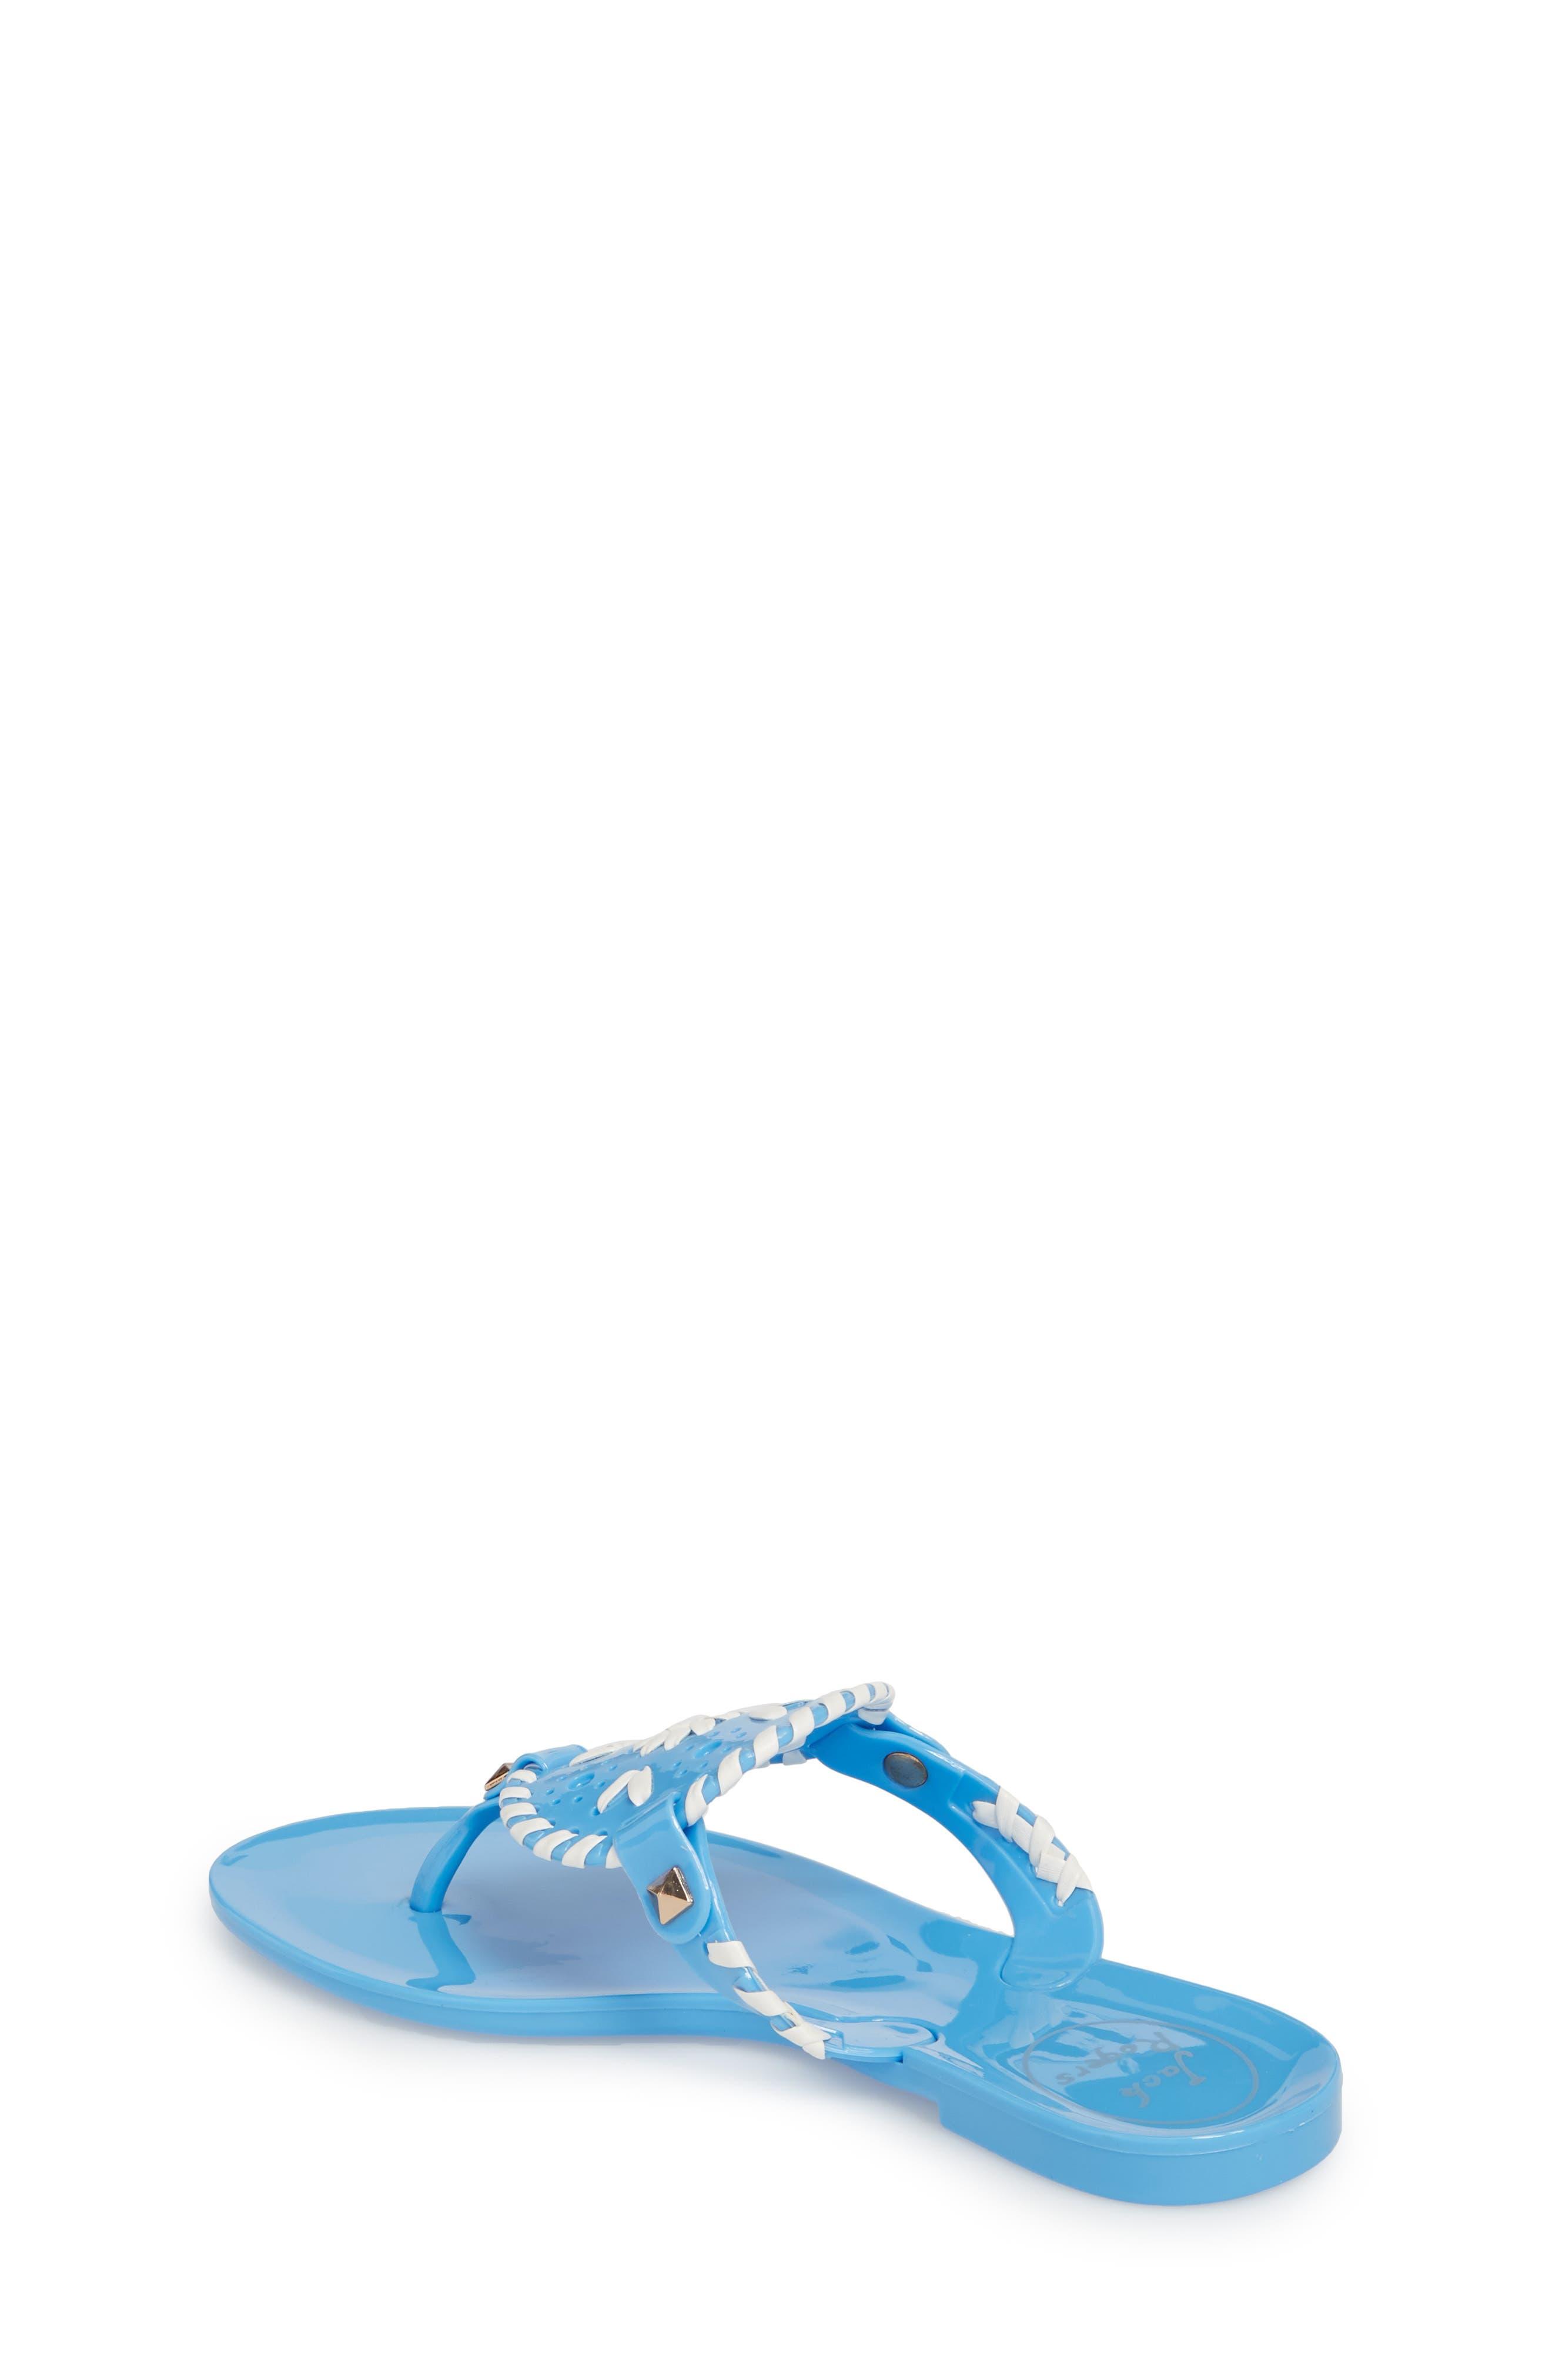 Alternate Image 2  - Jack Rogers 'Miss Georgica' Jelly Flip Flop (Walker, Toddler, Little Kid & Big Kid)